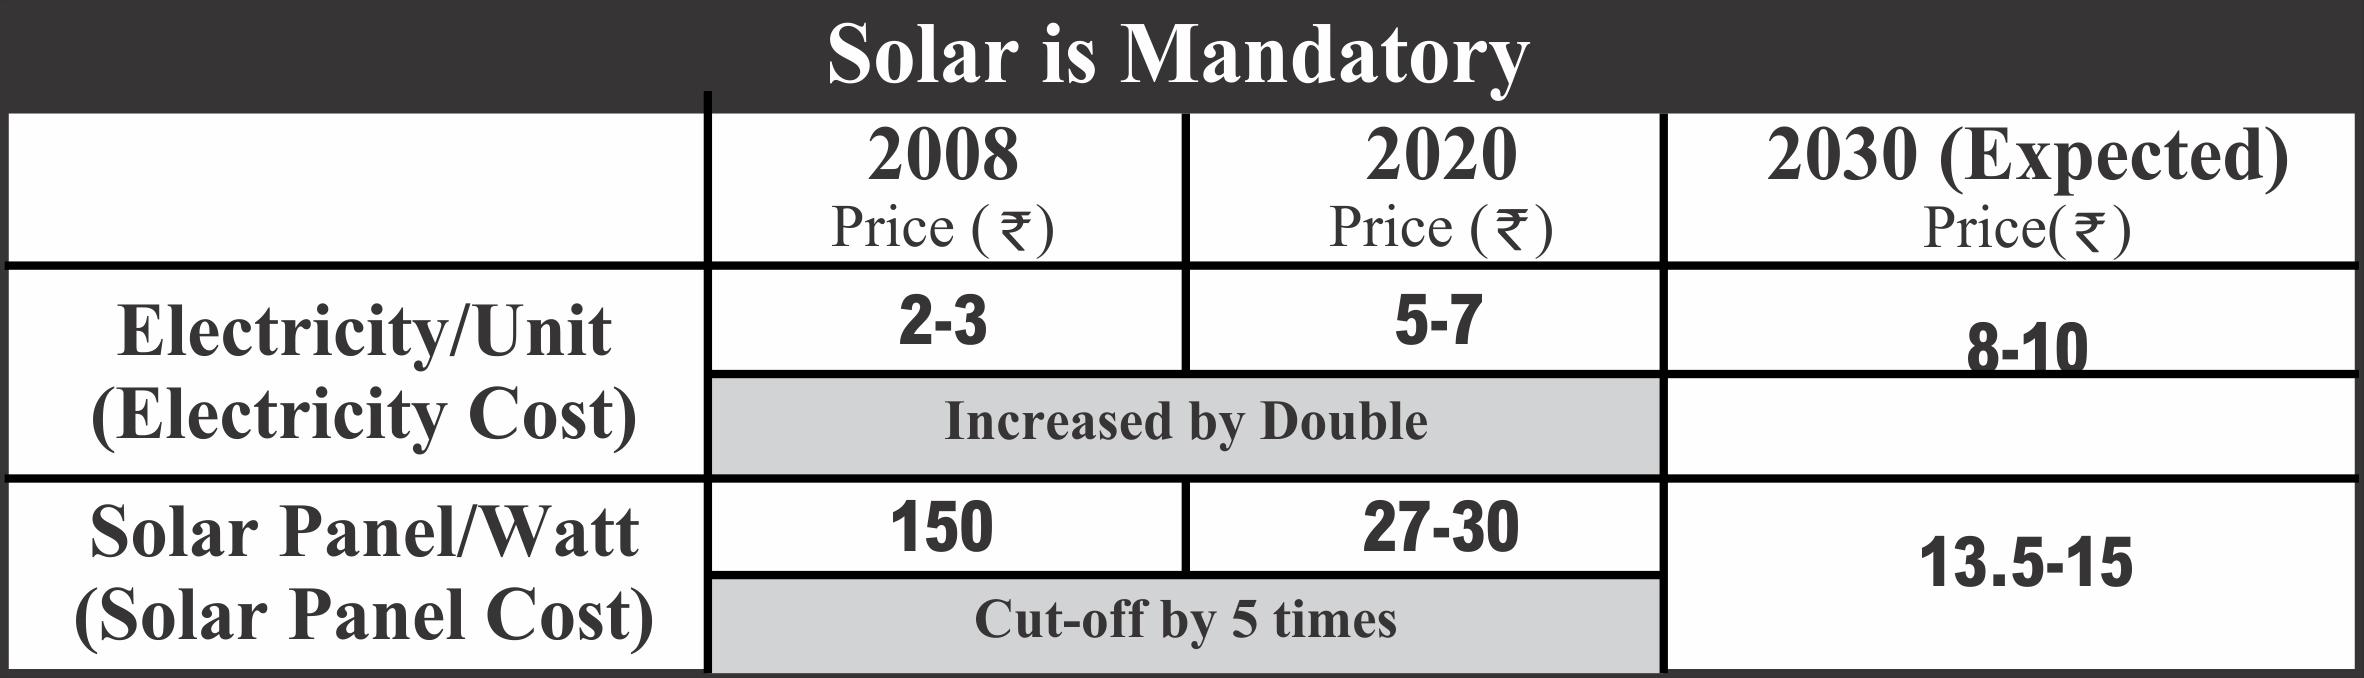 Solar Panel Price Comparison